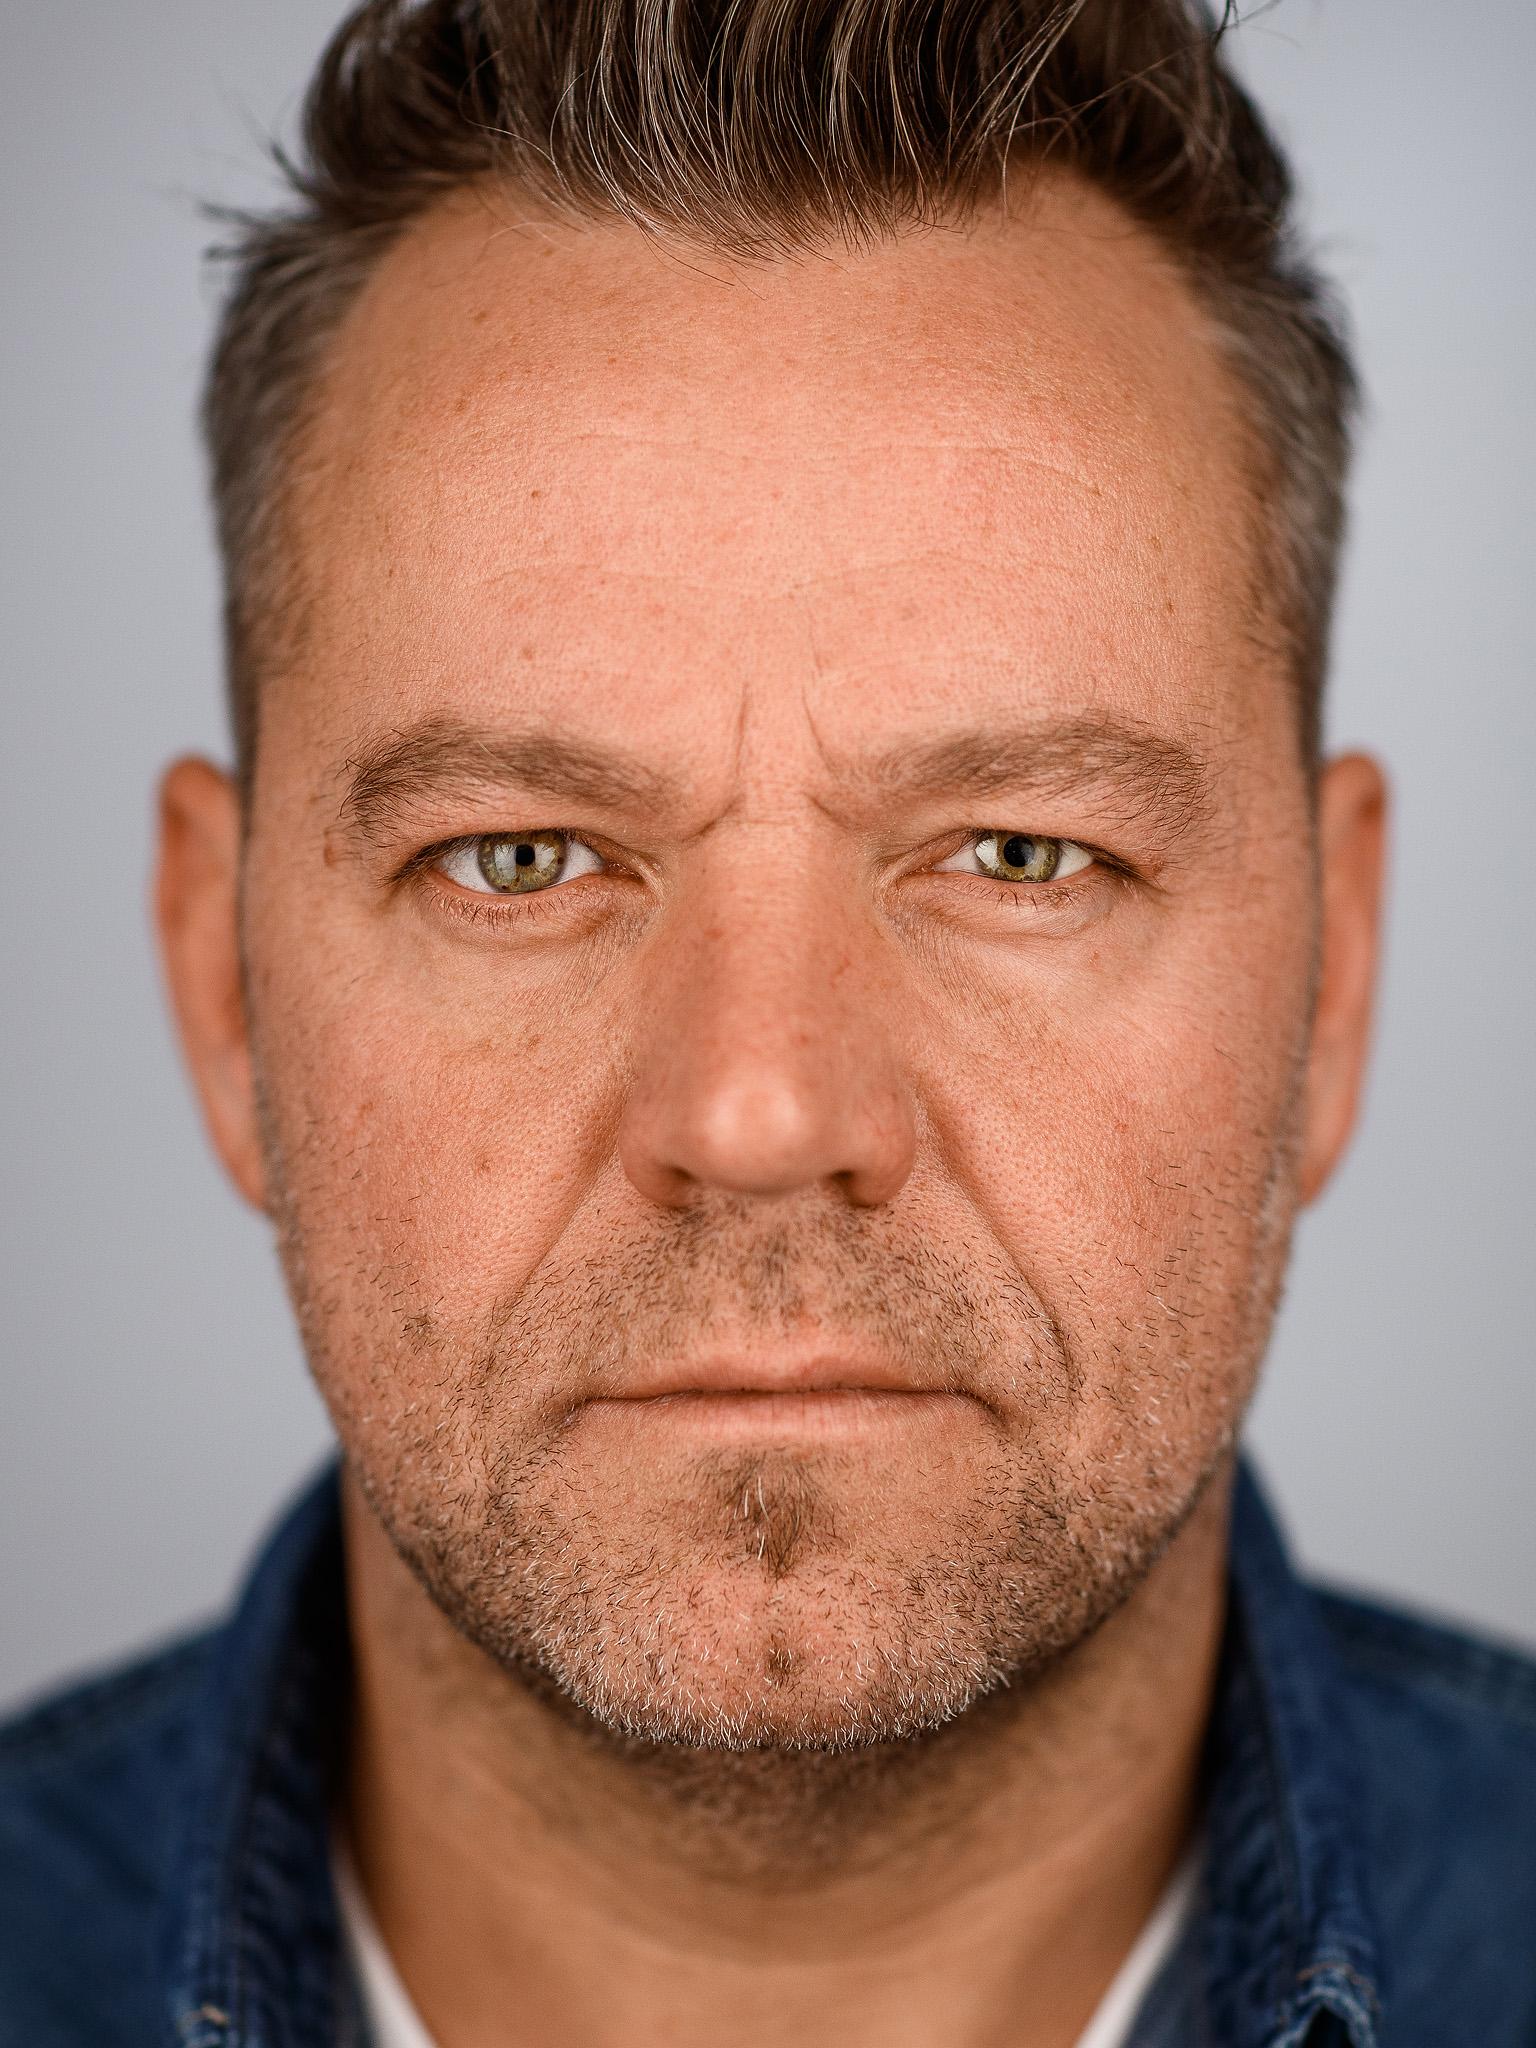 Ronny_Jan Cornelis.jpg